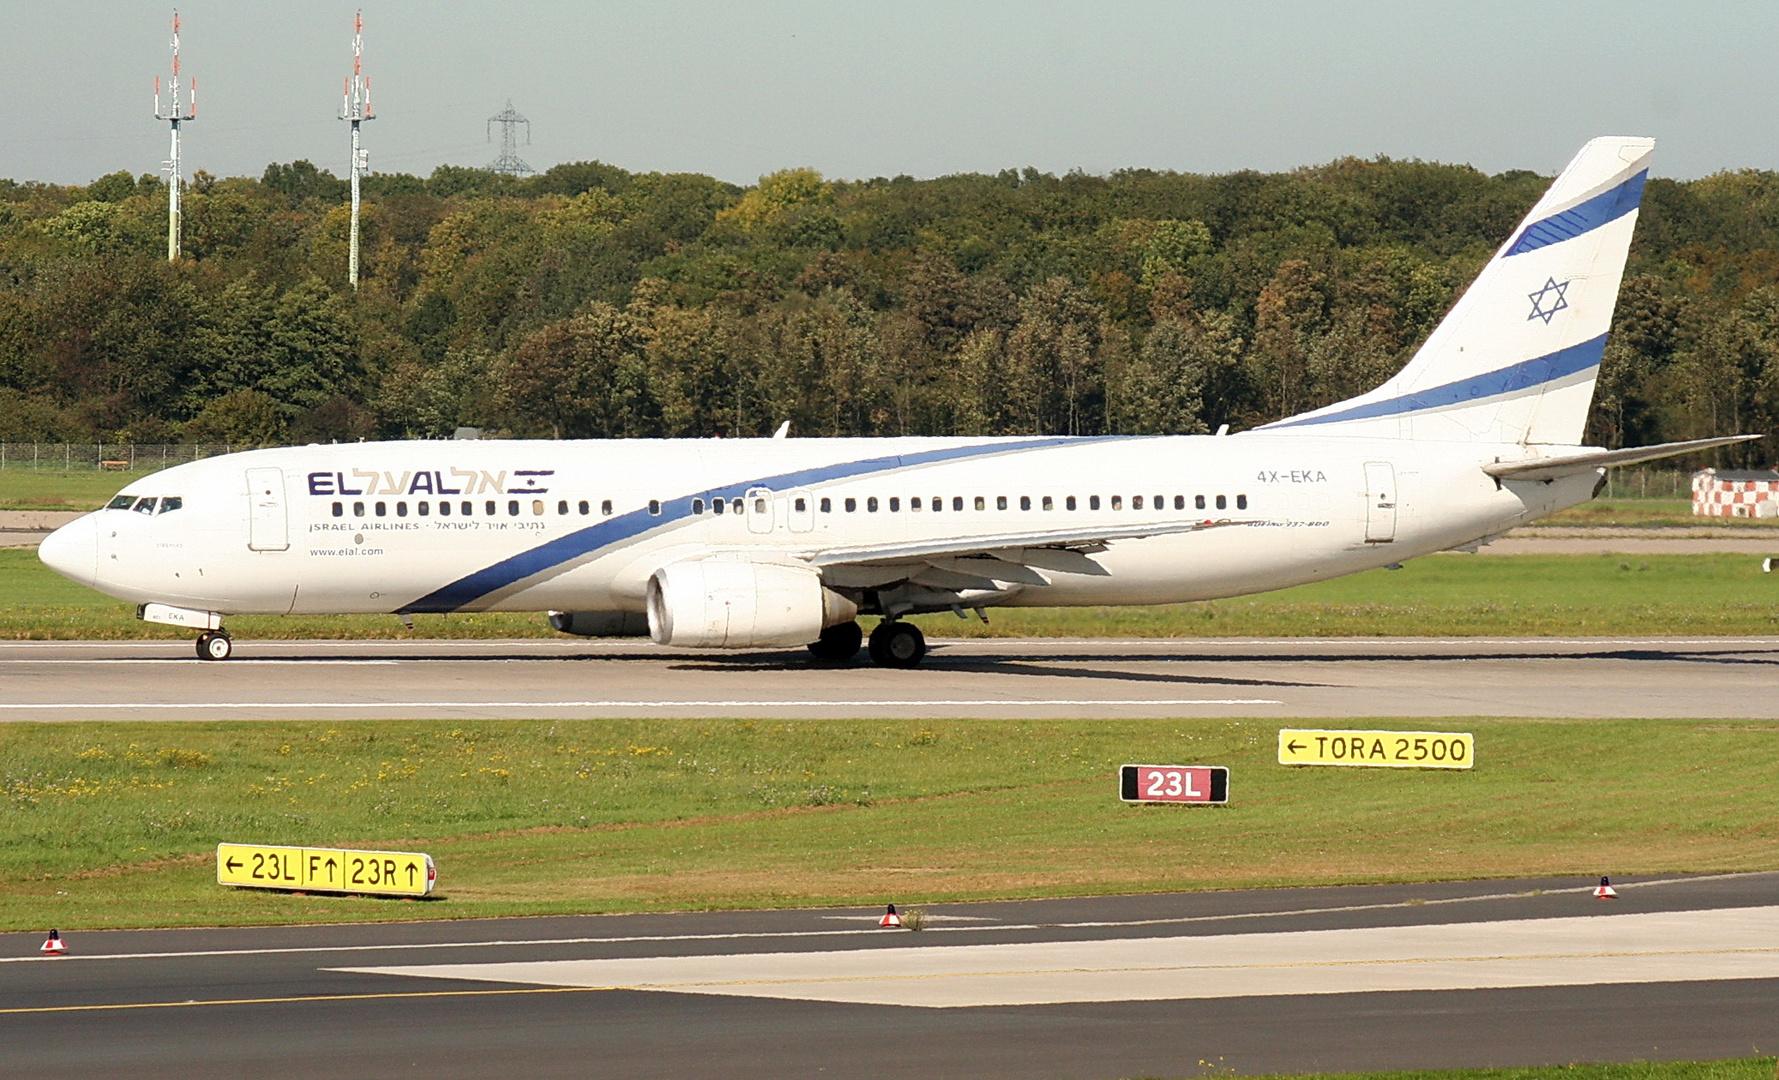 737-800 ELAL